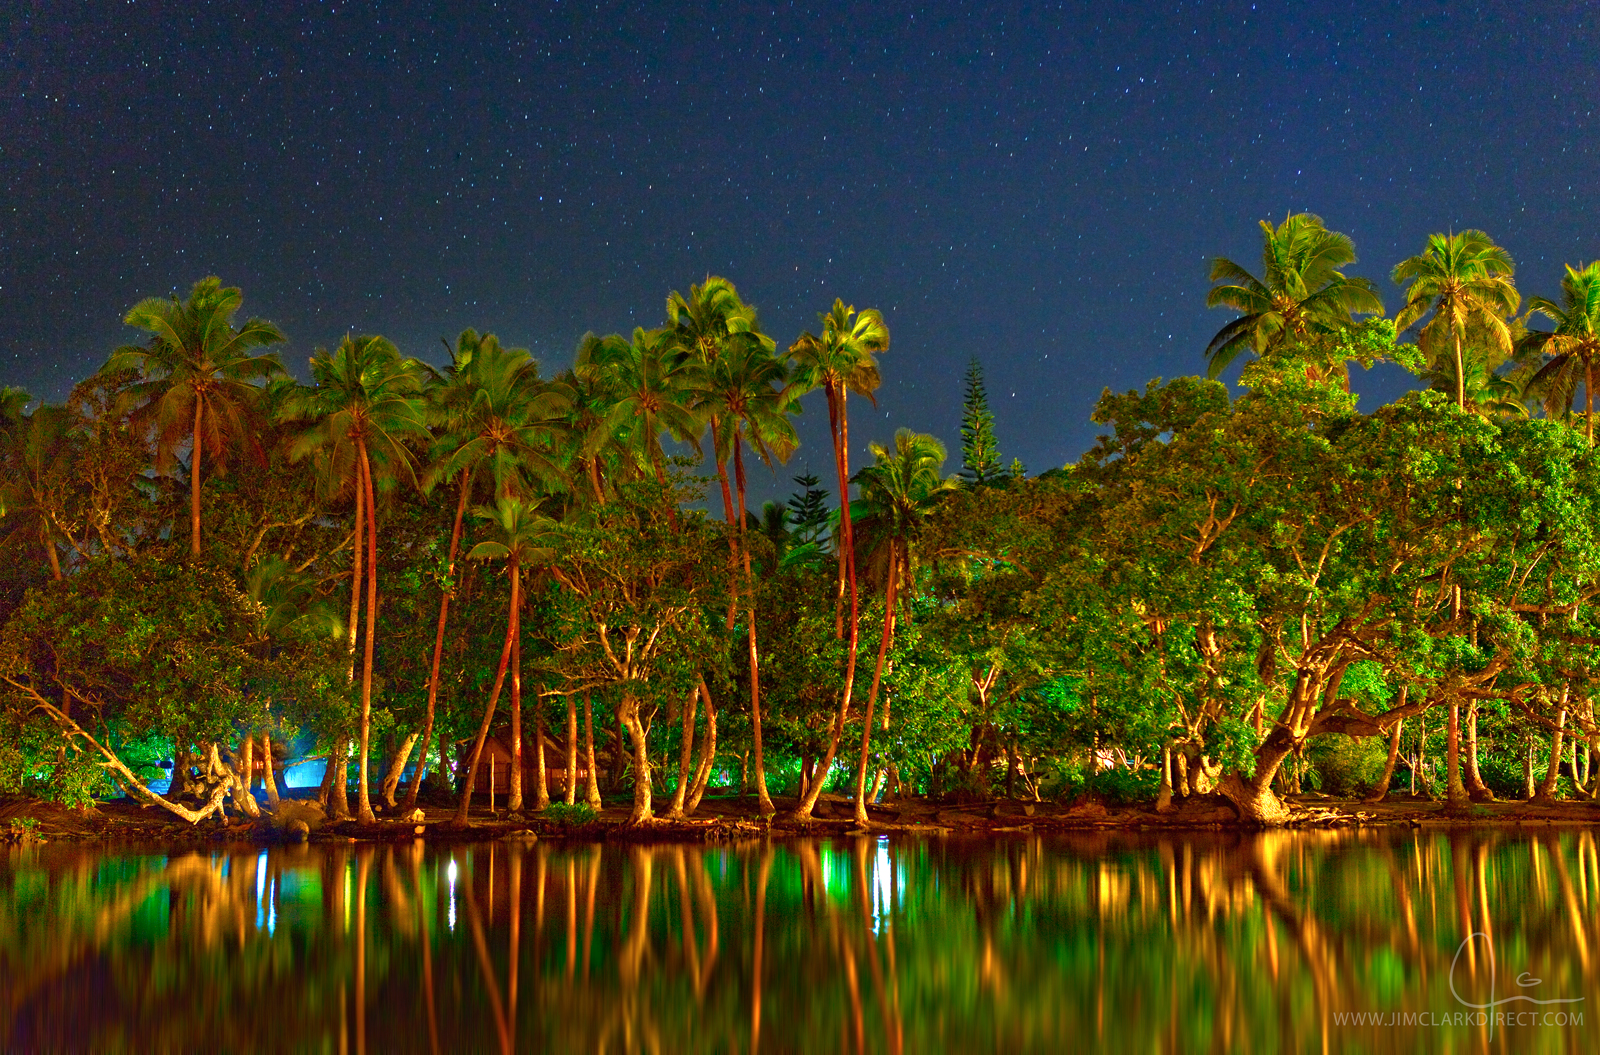 LAGOON REFLECTIONS ON EFATE, VANUATU